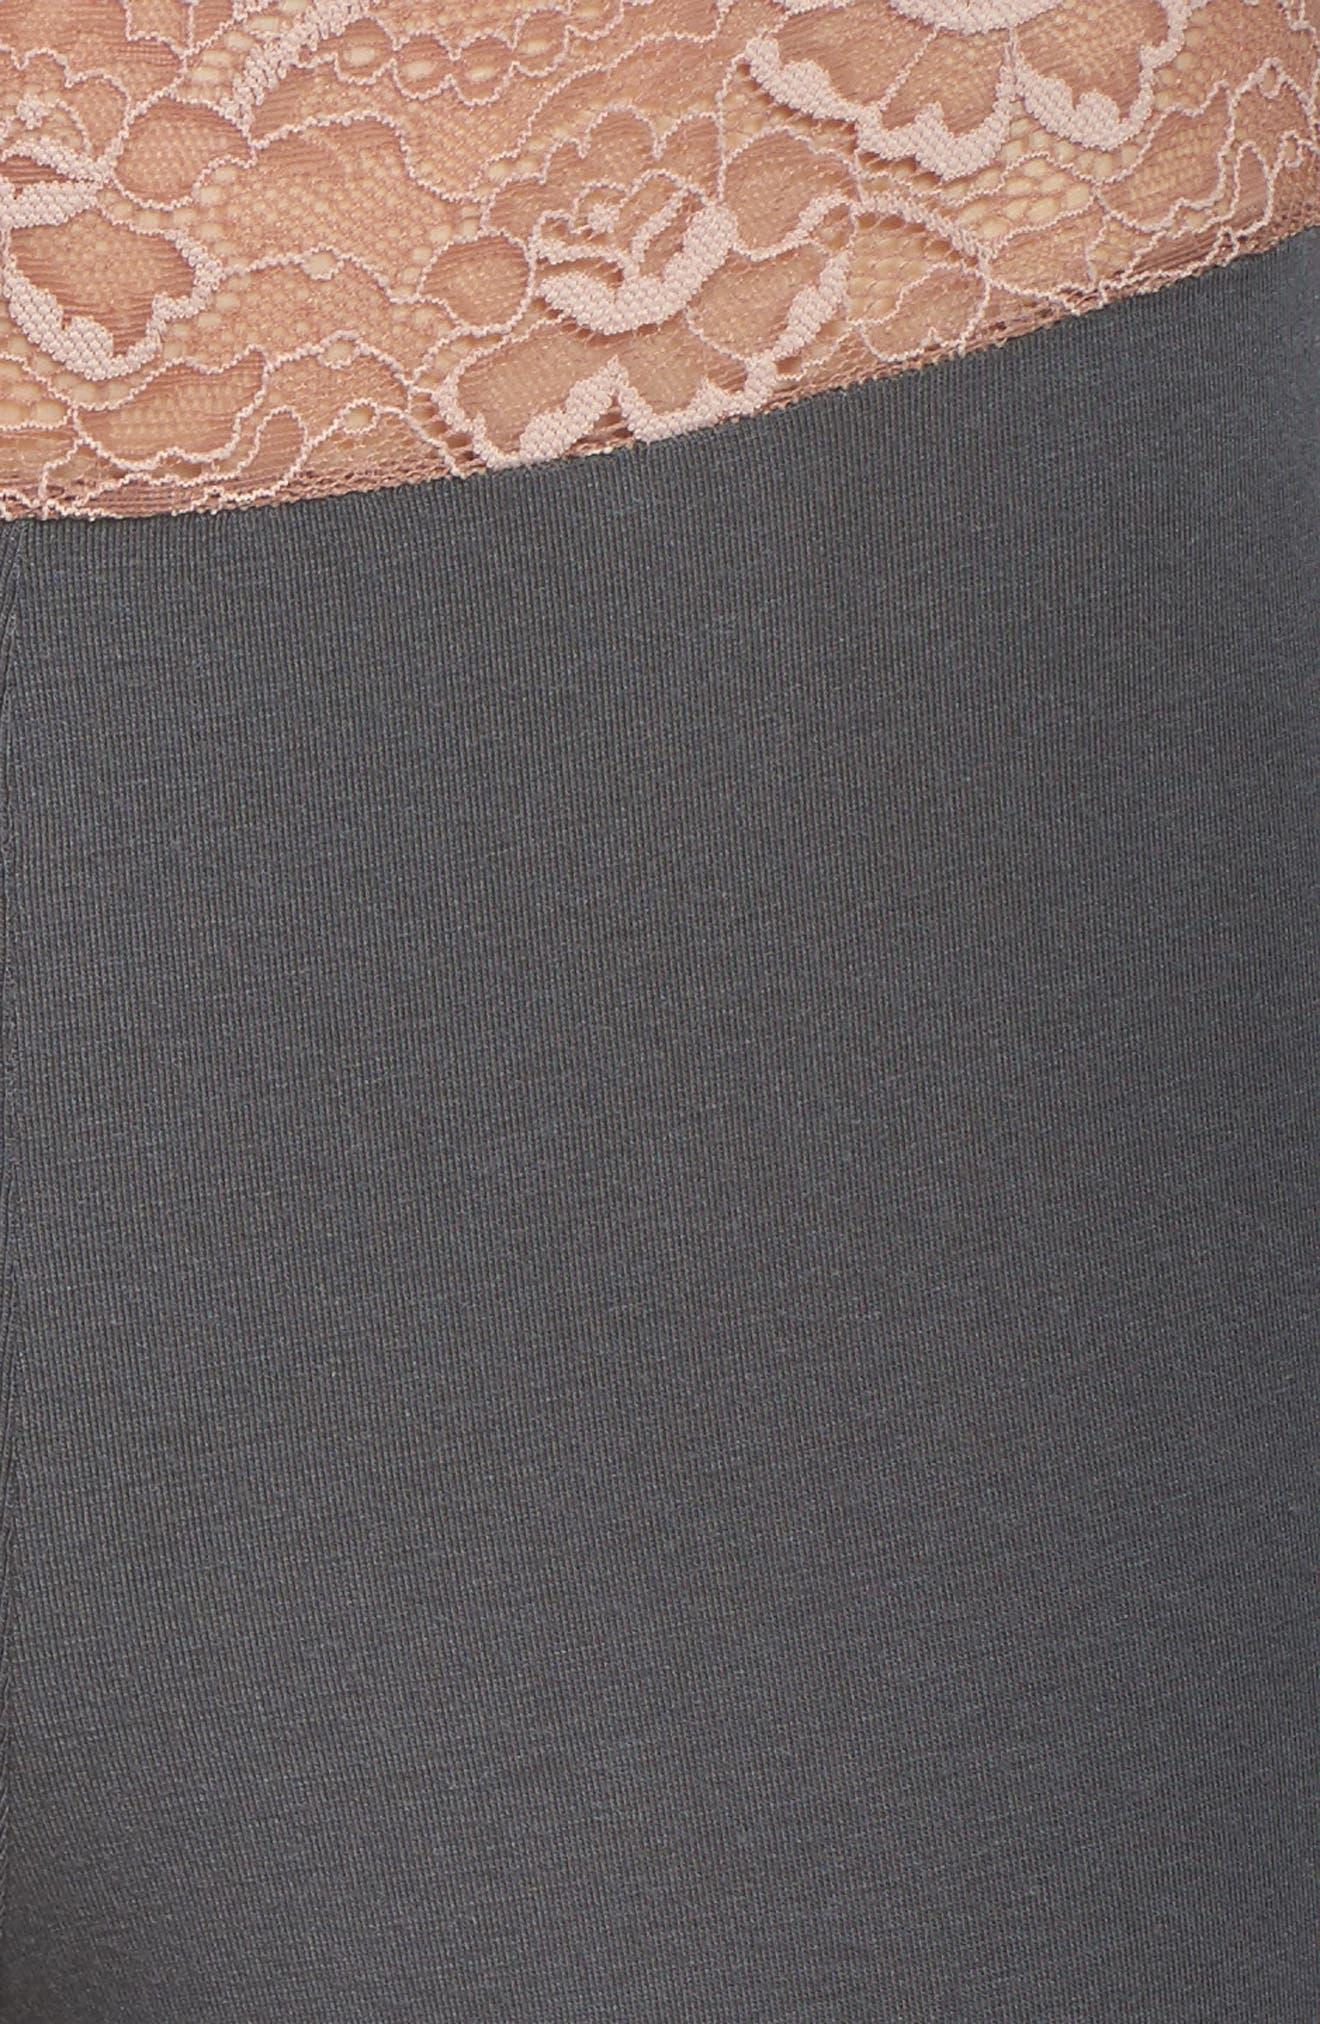 Lace Trim Pants,                             Alternate thumbnail 5, color,                             SLATE WITH JAVA LACE